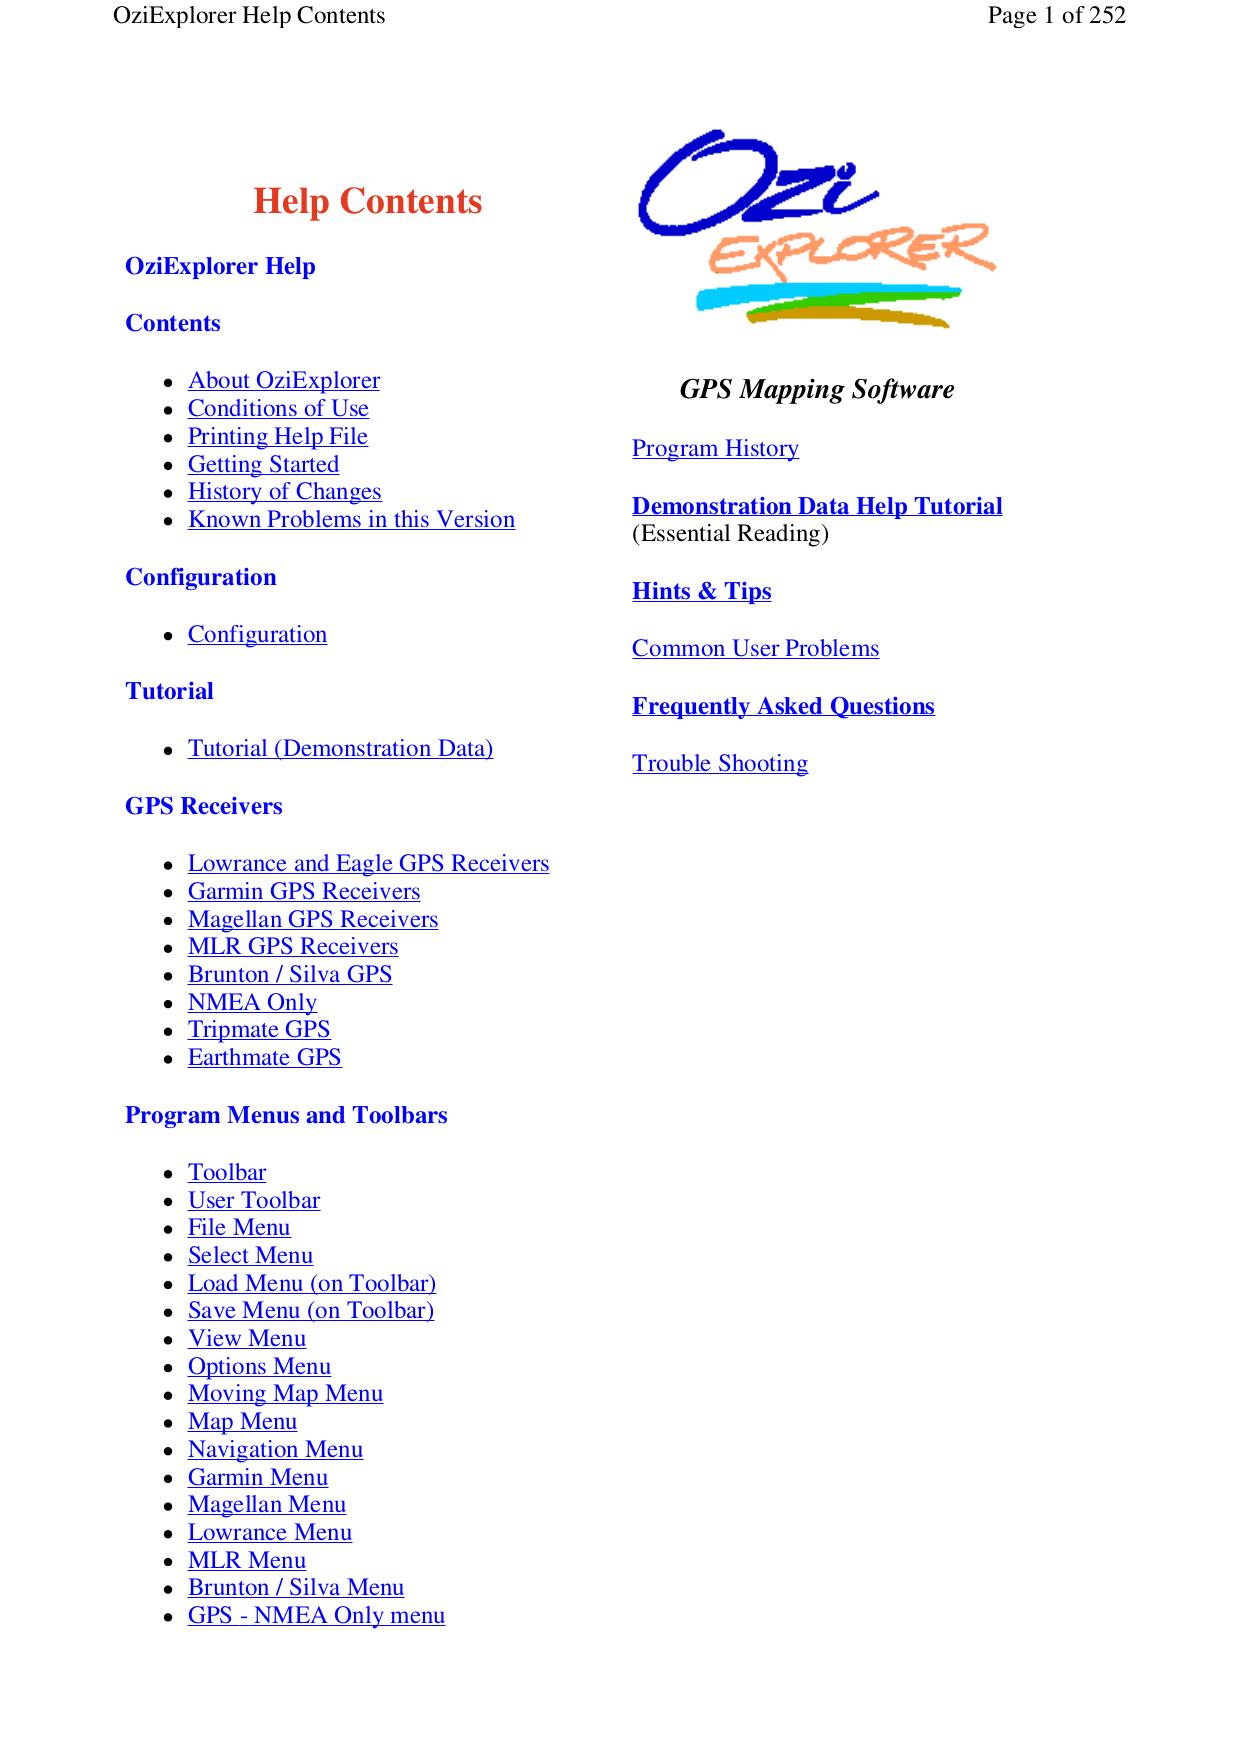 pdf for Lowrance GPS iFINDER Explorer manual